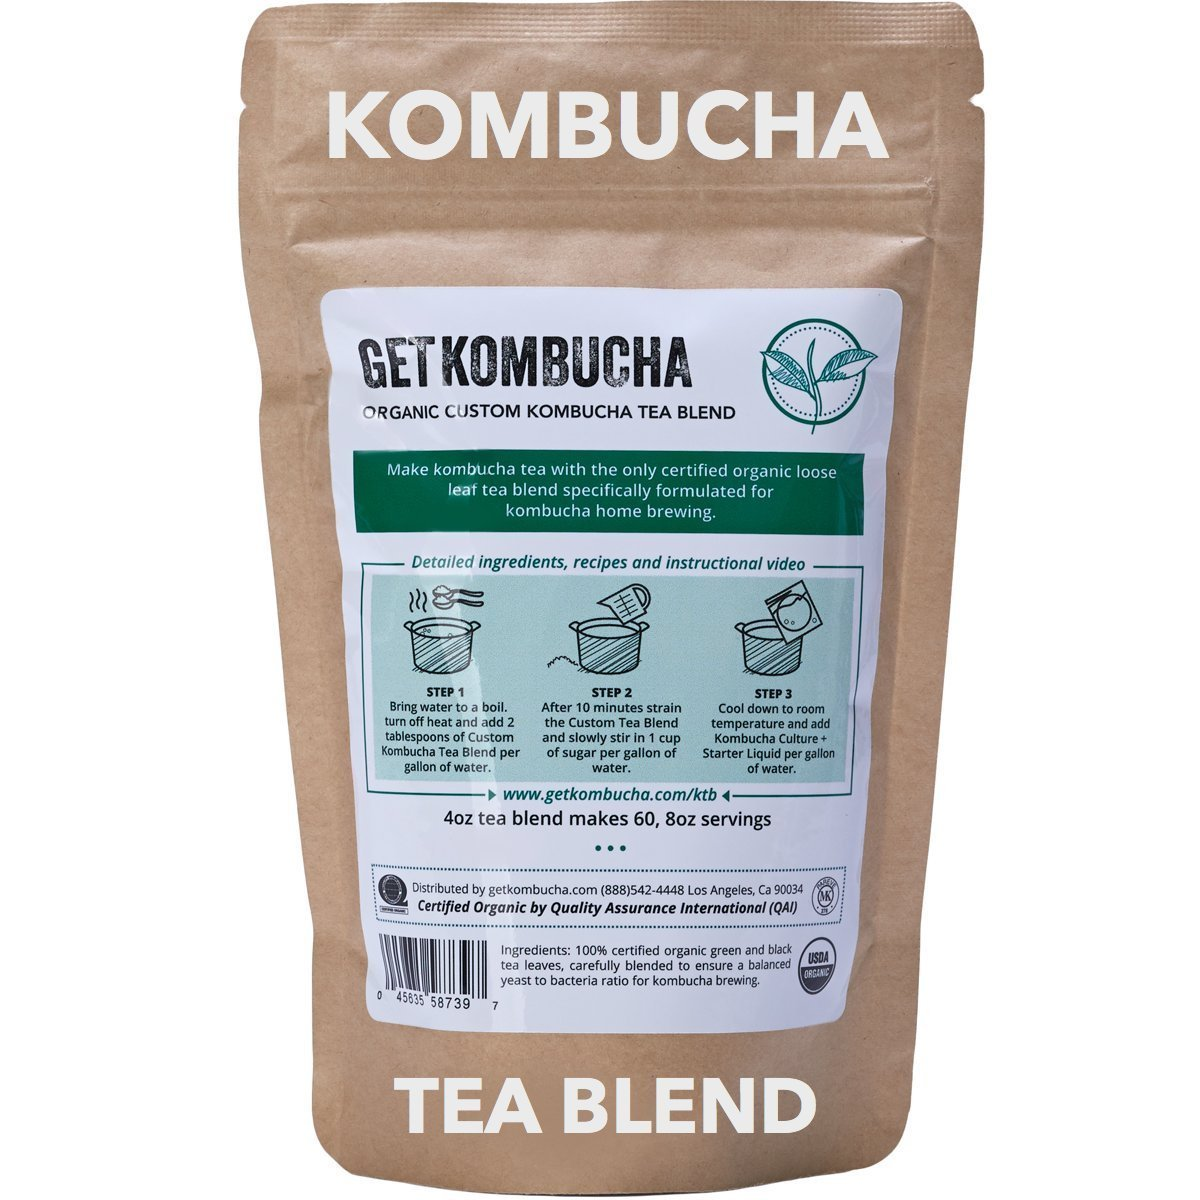 Get Kombucha, Certified Organic Kombucha Tea Blend - (60 Servings) 4 Ounce